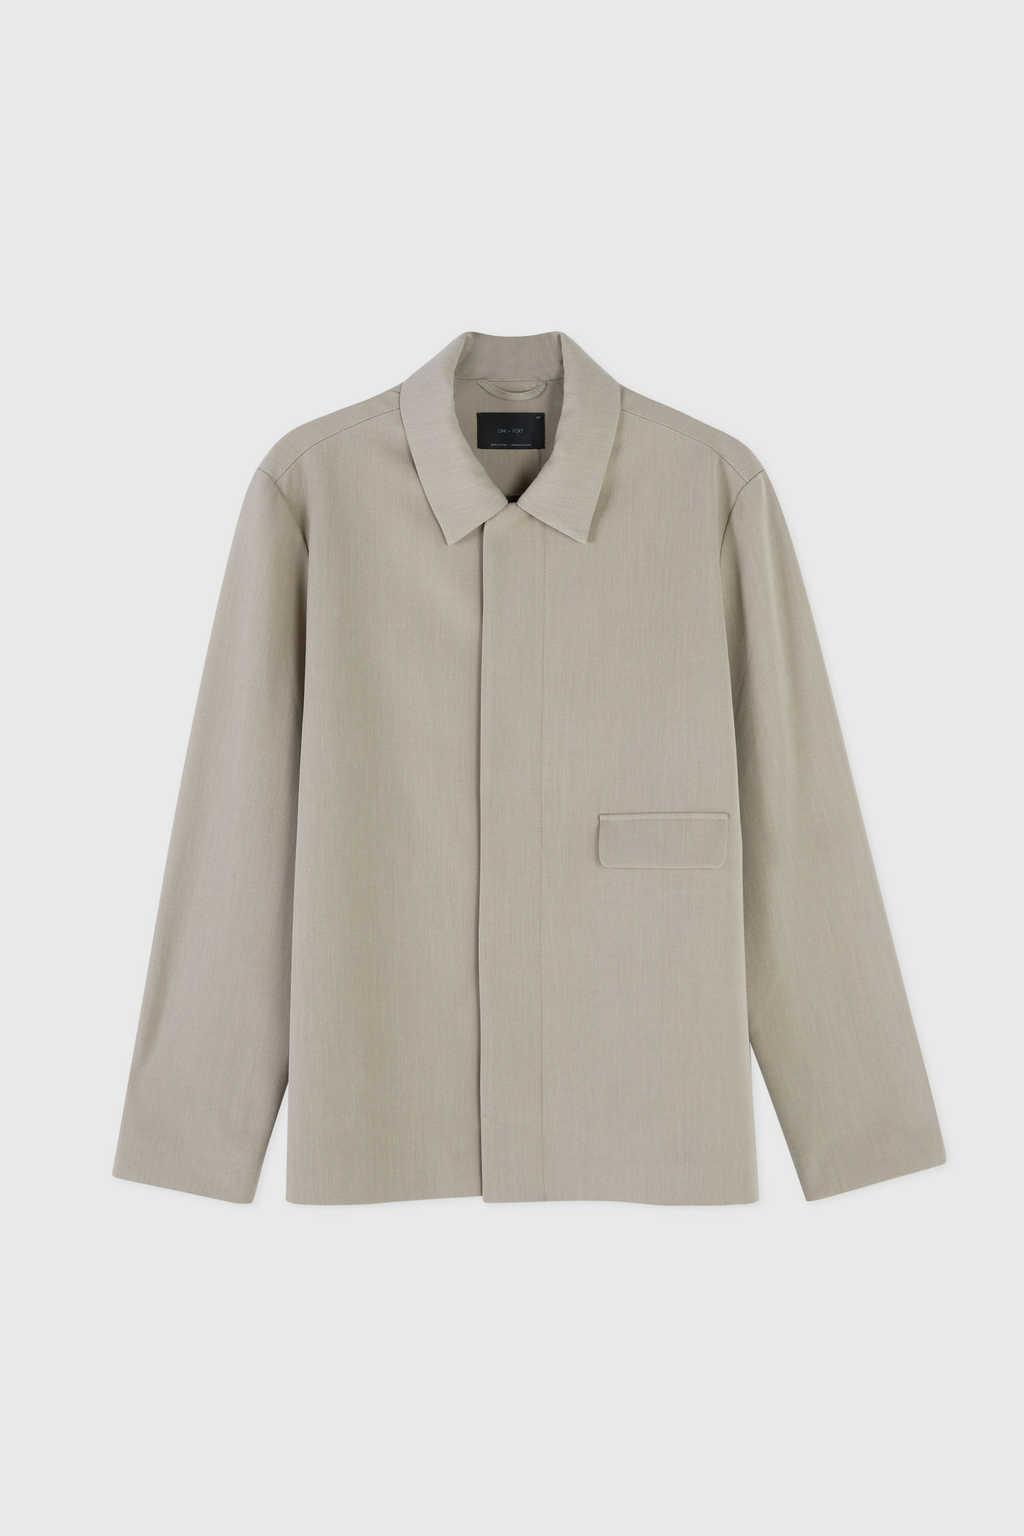 Jacket 3362 Beige 7